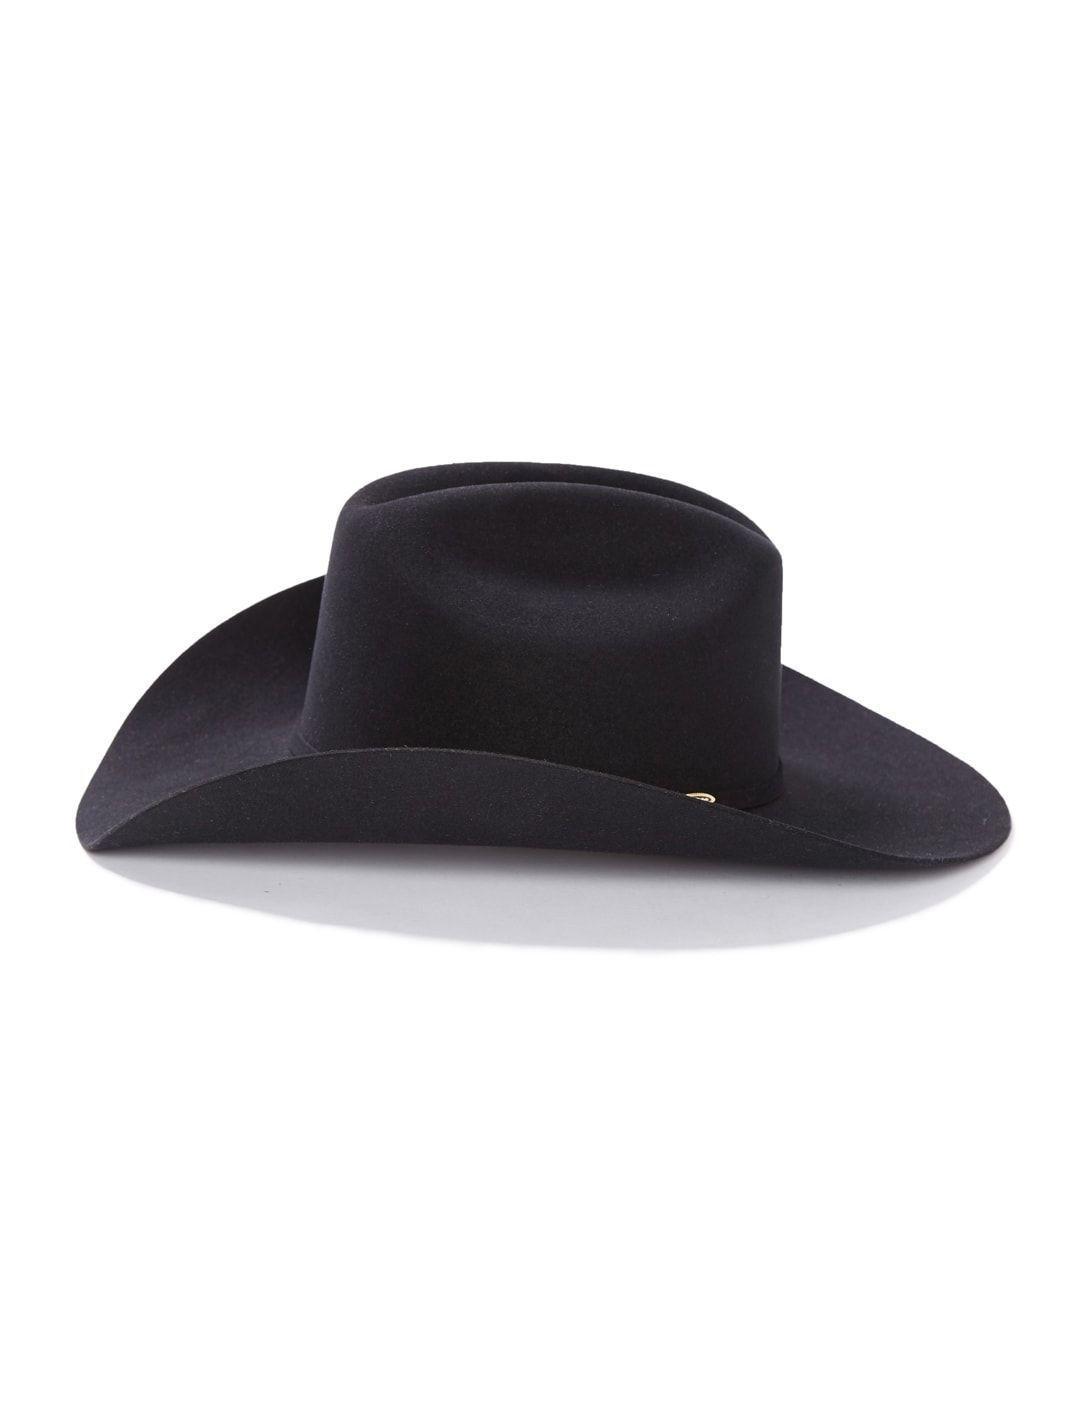 bde1dea5d41e9 Stetson HighPoint 6X Cowboy Hat Black 3 Piece Silver Tone Buckel Quality  Fur Felt Item SFHIPT7740